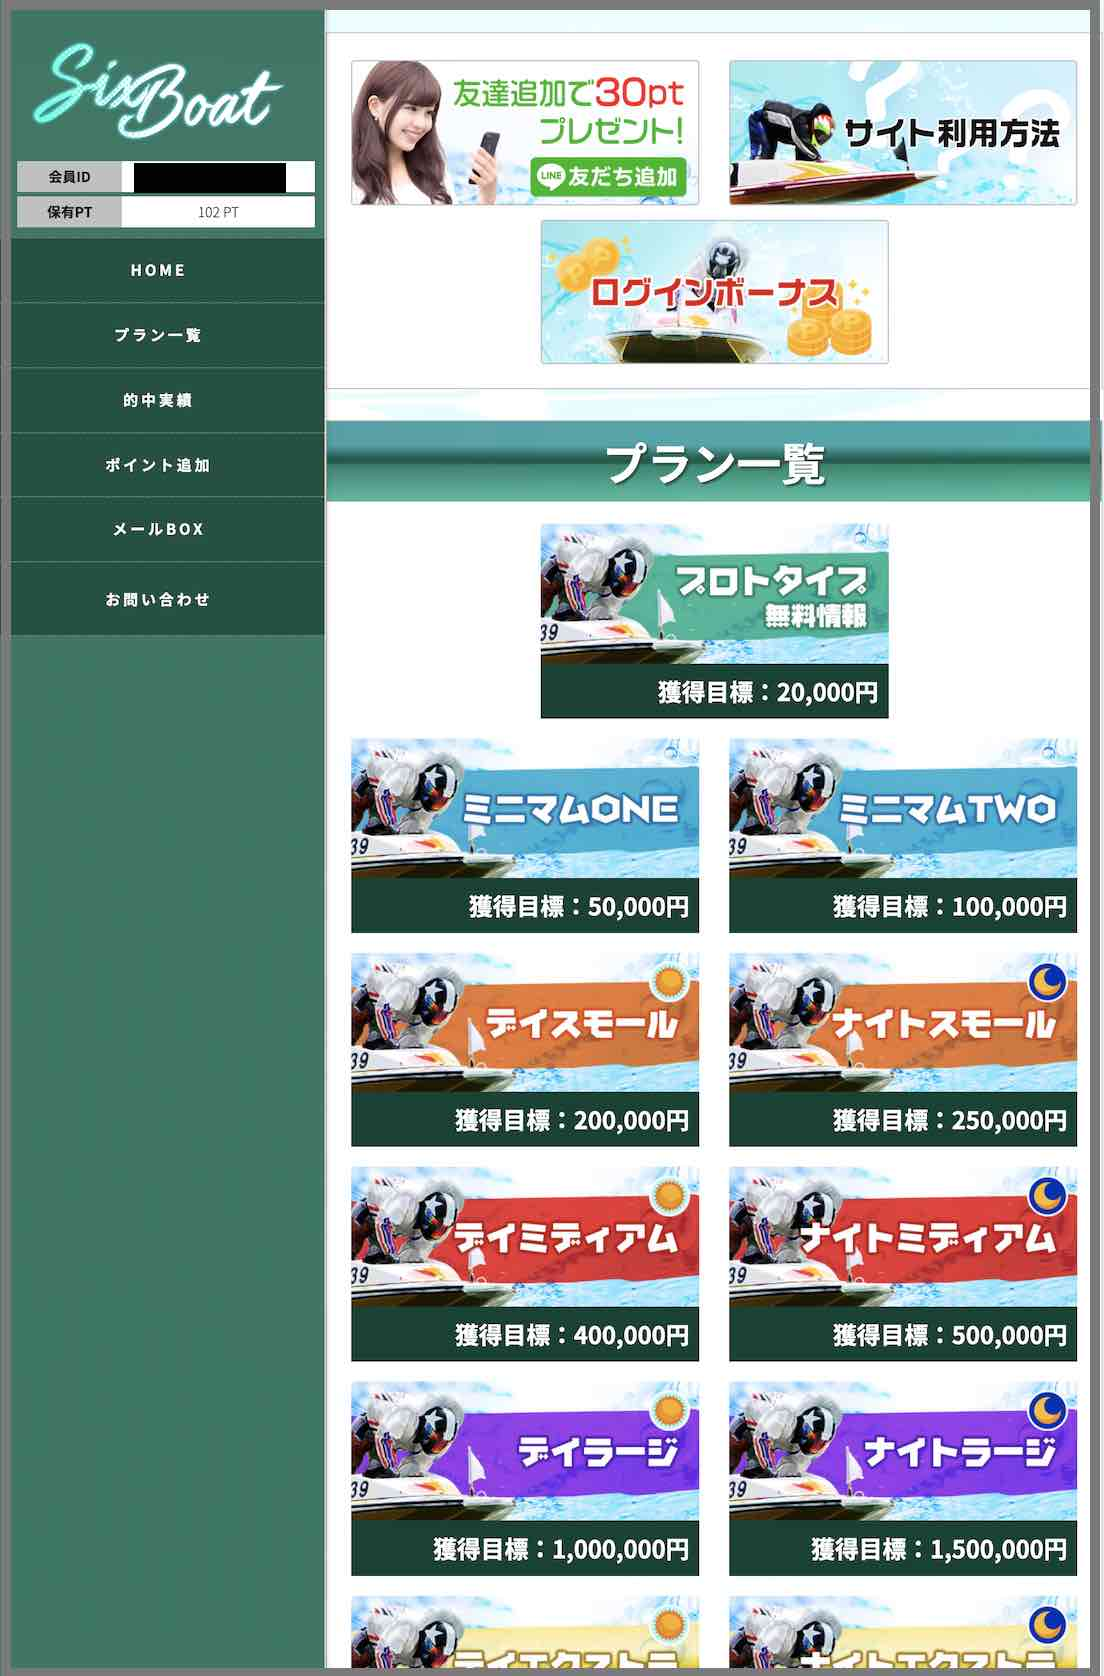 SIXBOAT(シックスボート)という競艇予想サイト(ボートレース予想サイト)の会員ページ